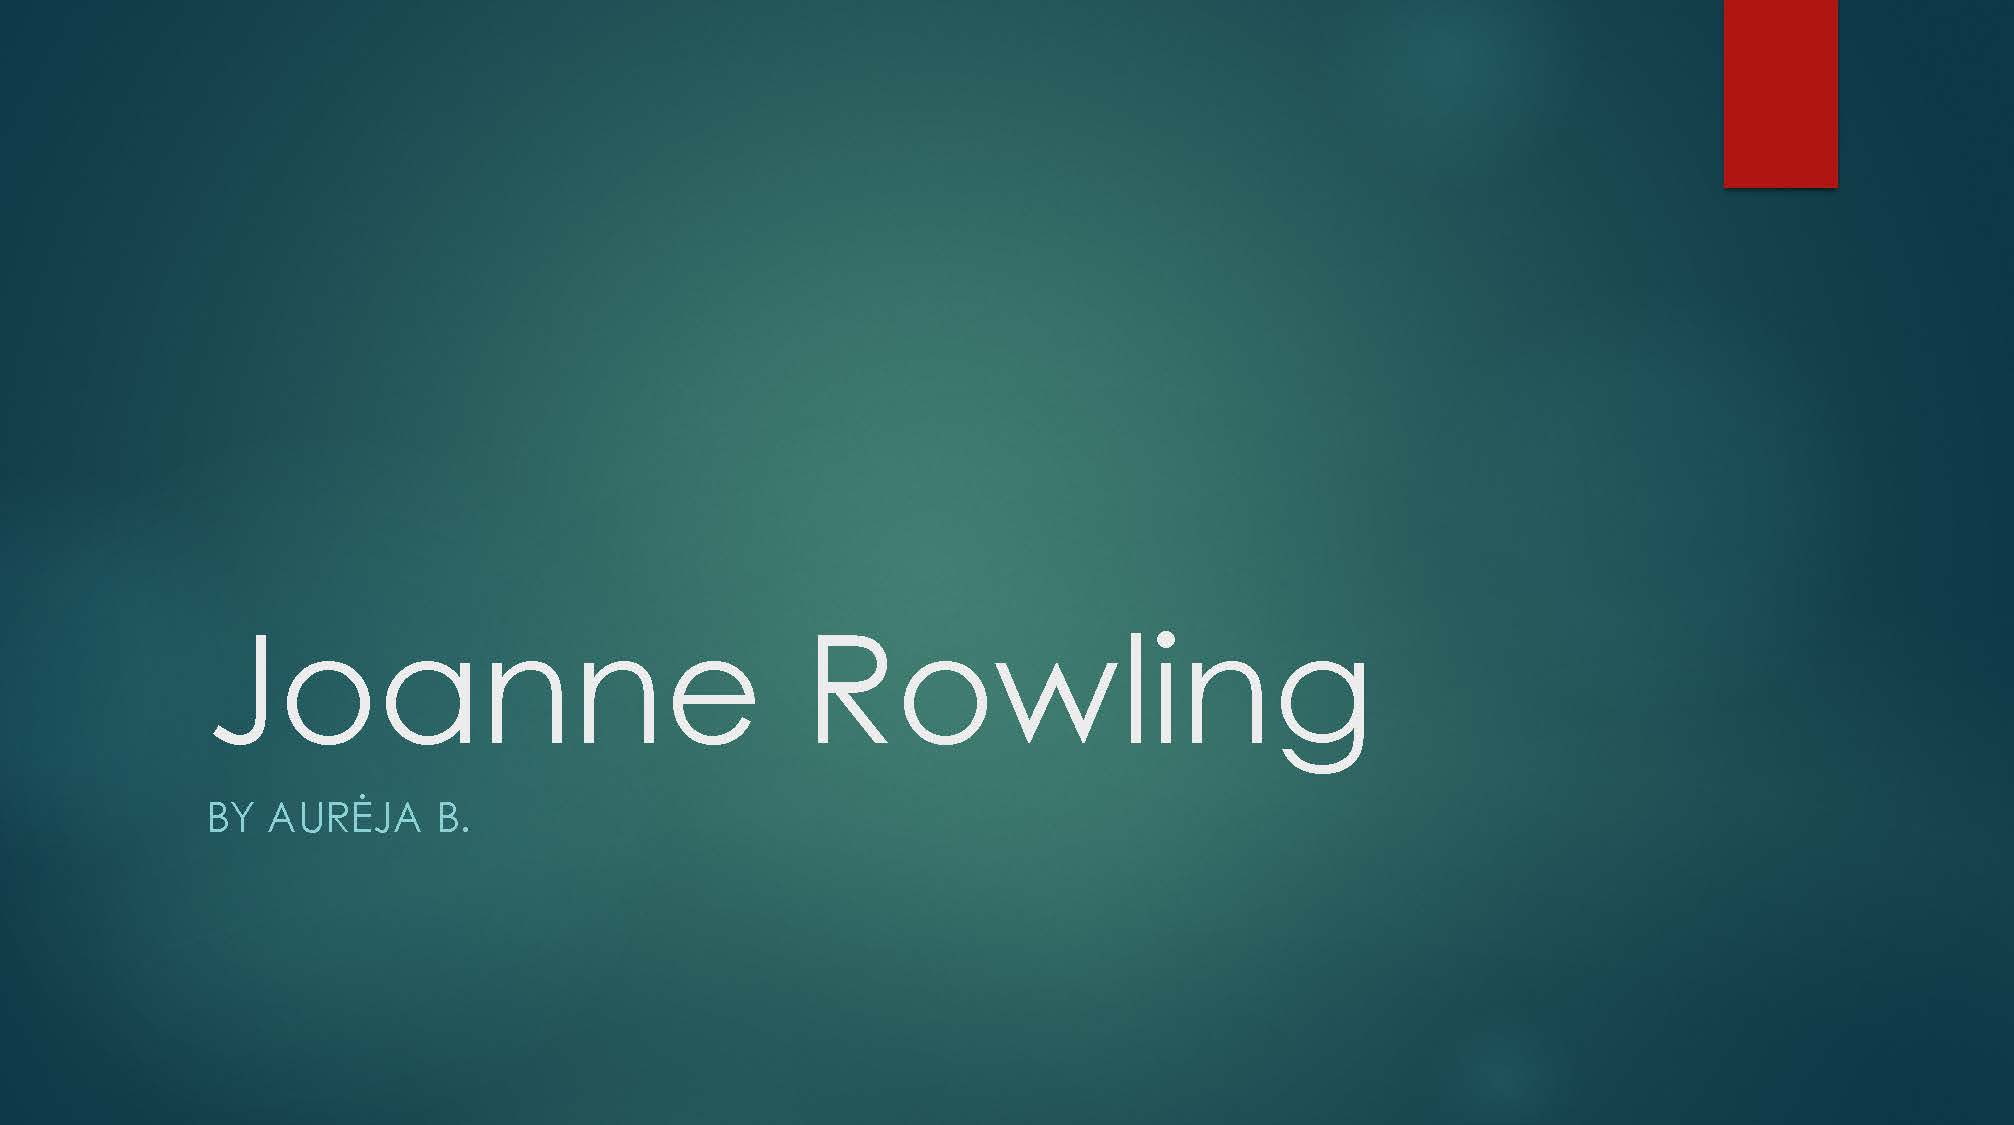 Joanne-Rowling_Page_1